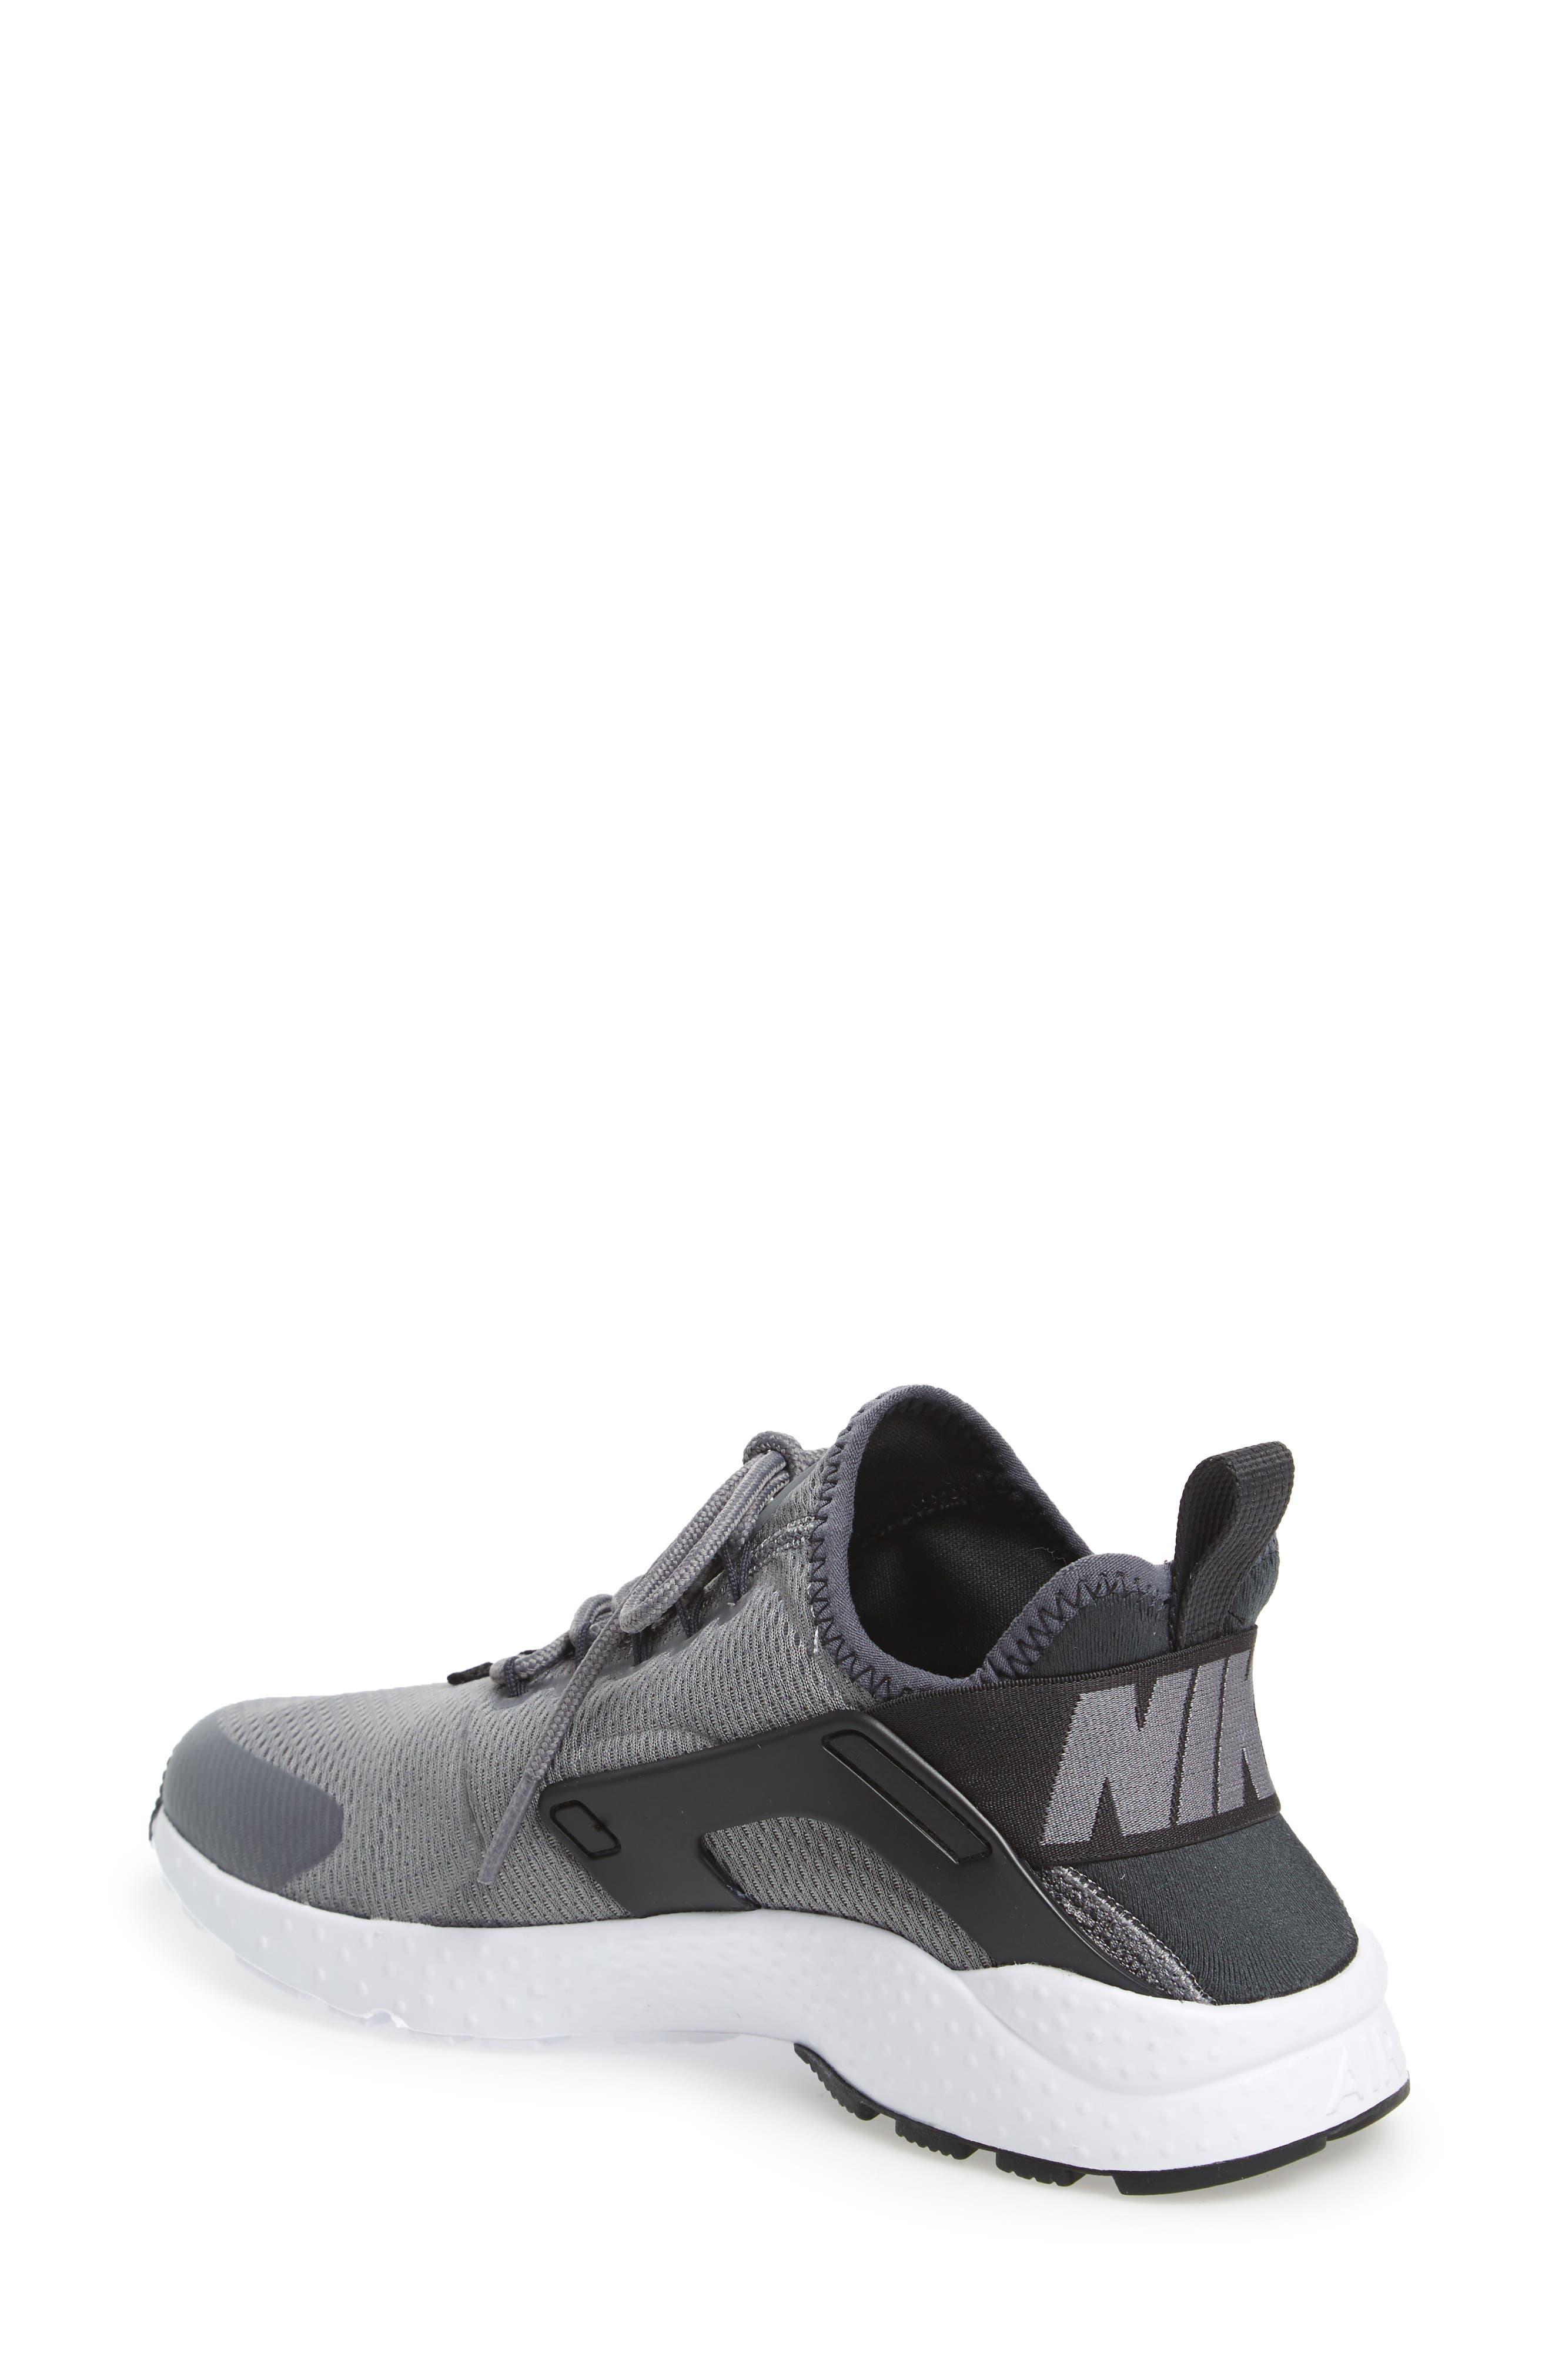 Air Huarache Sneaker,                             Alternate thumbnail 55, color,